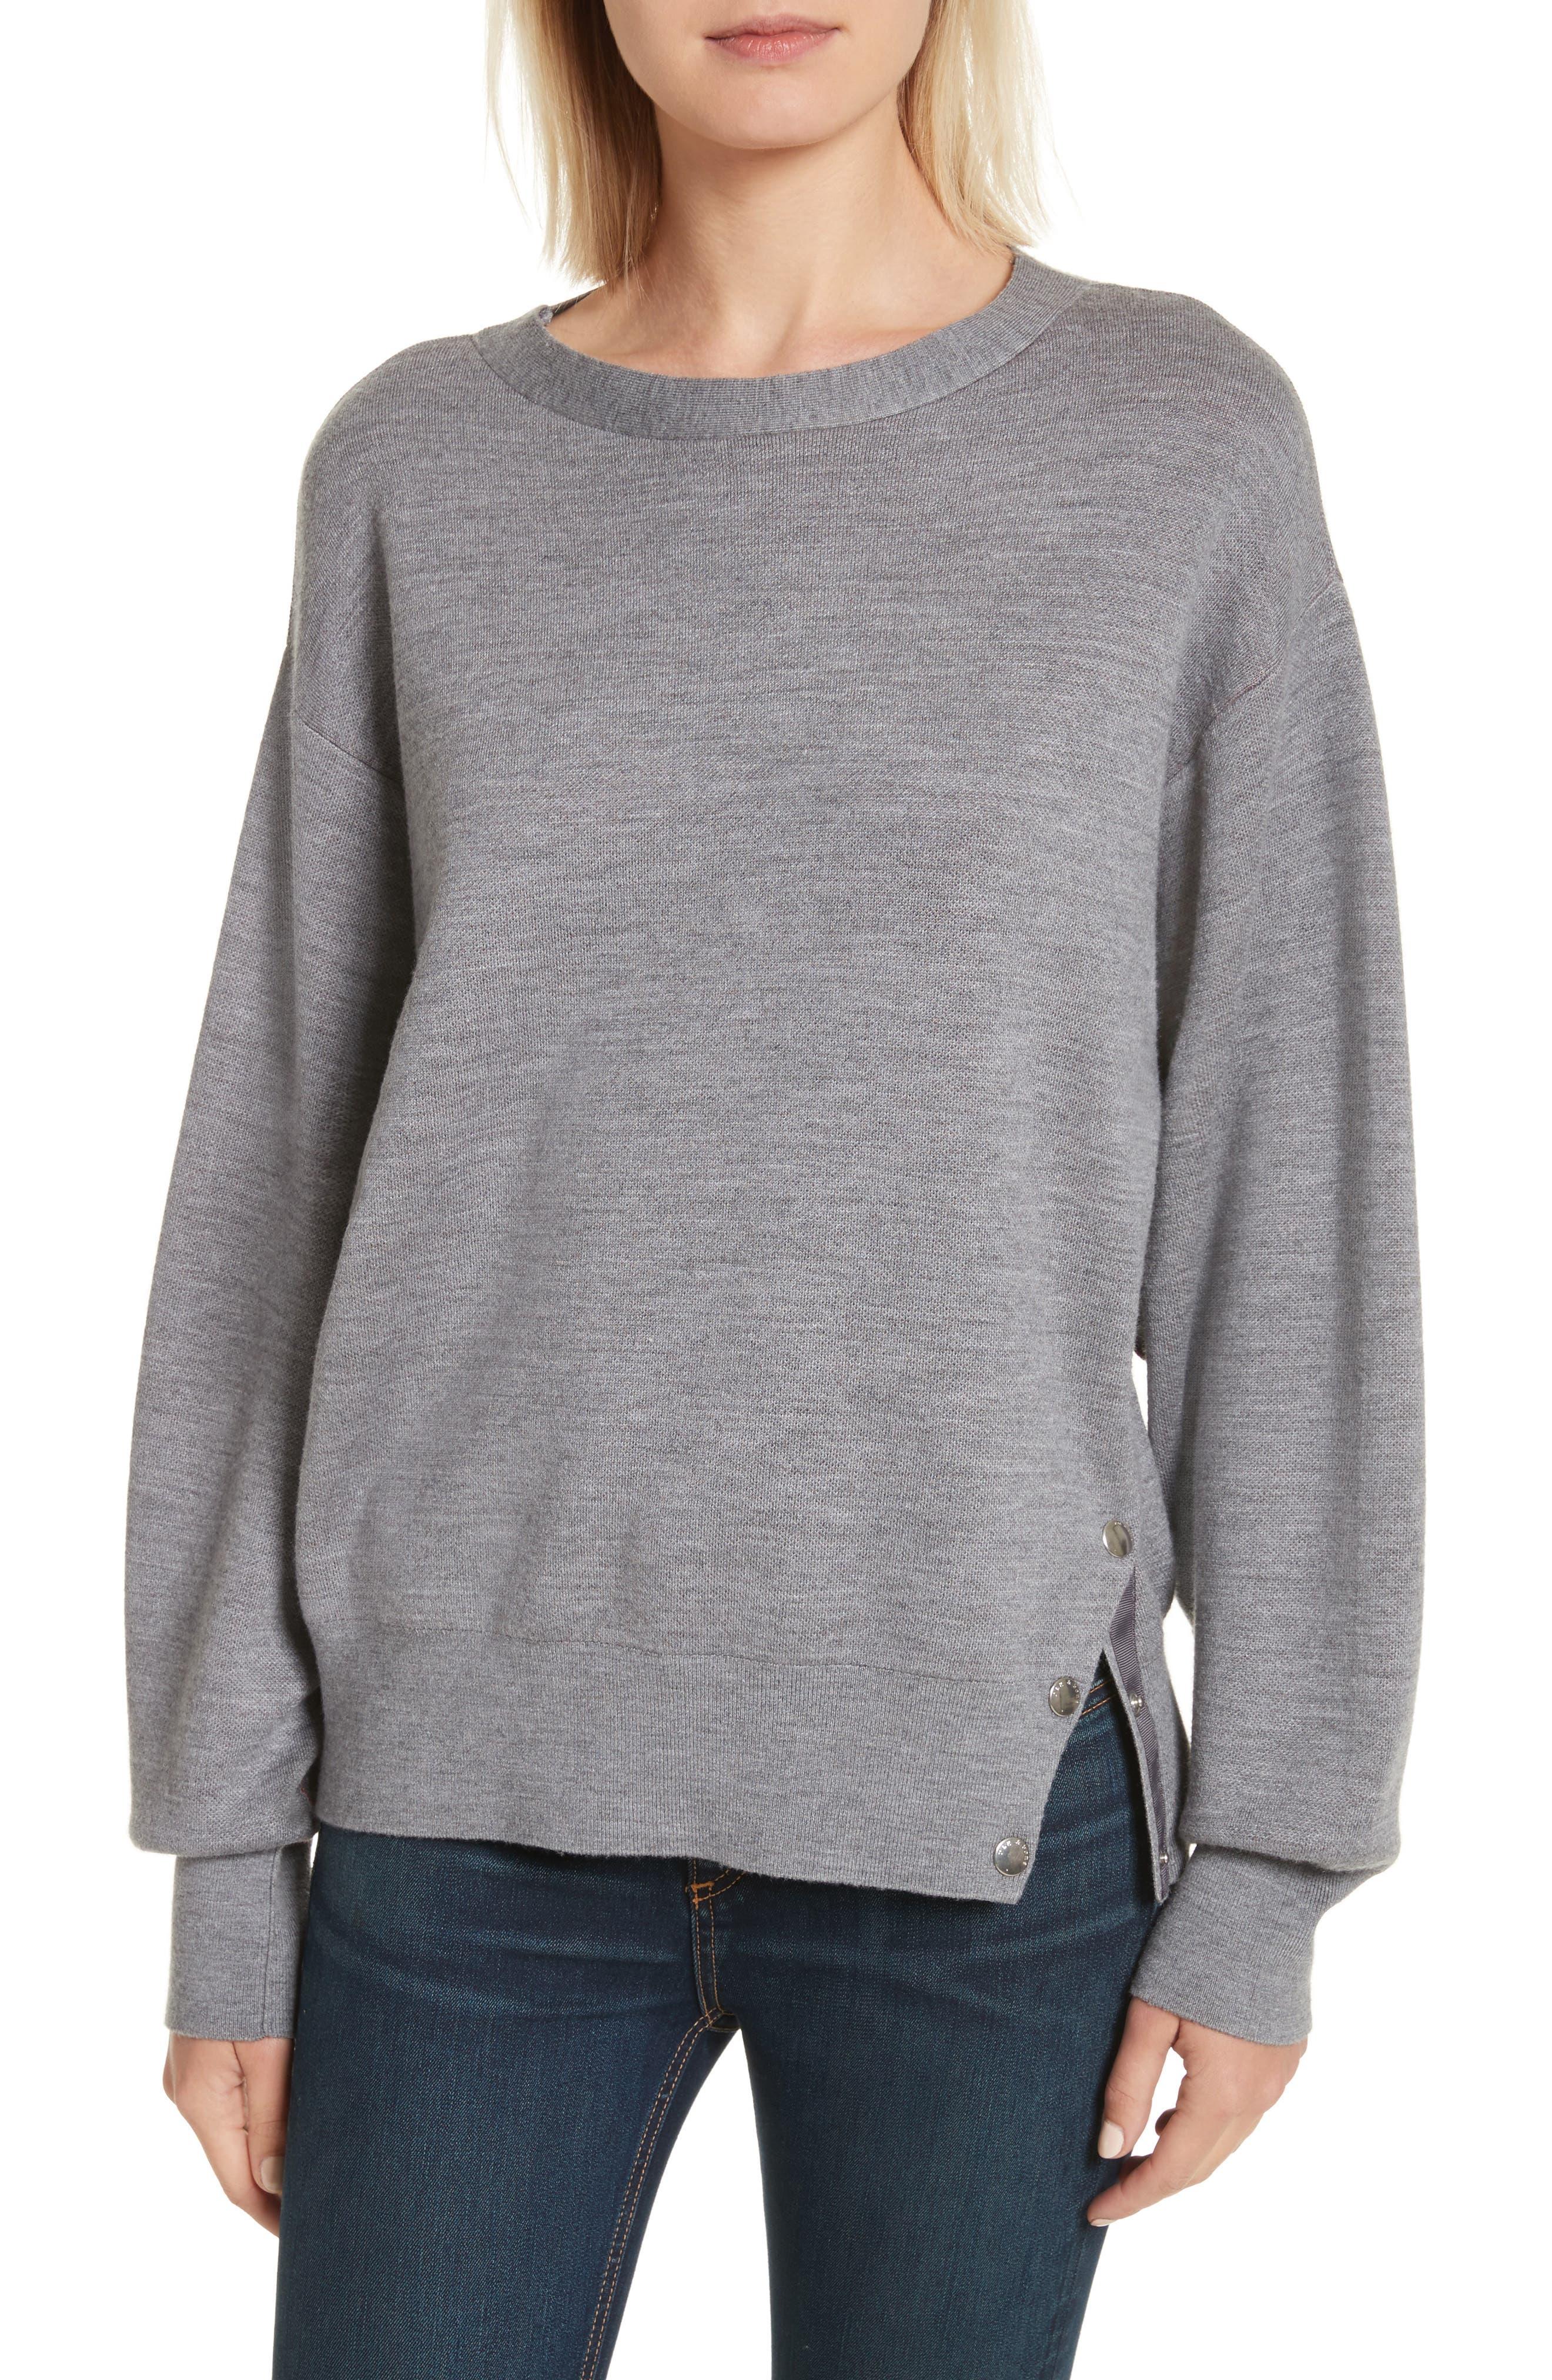 Alternate Image 1 Selected - rag & bone Saralyn Merino Wool & Cotton Blend Crewneck Sweater